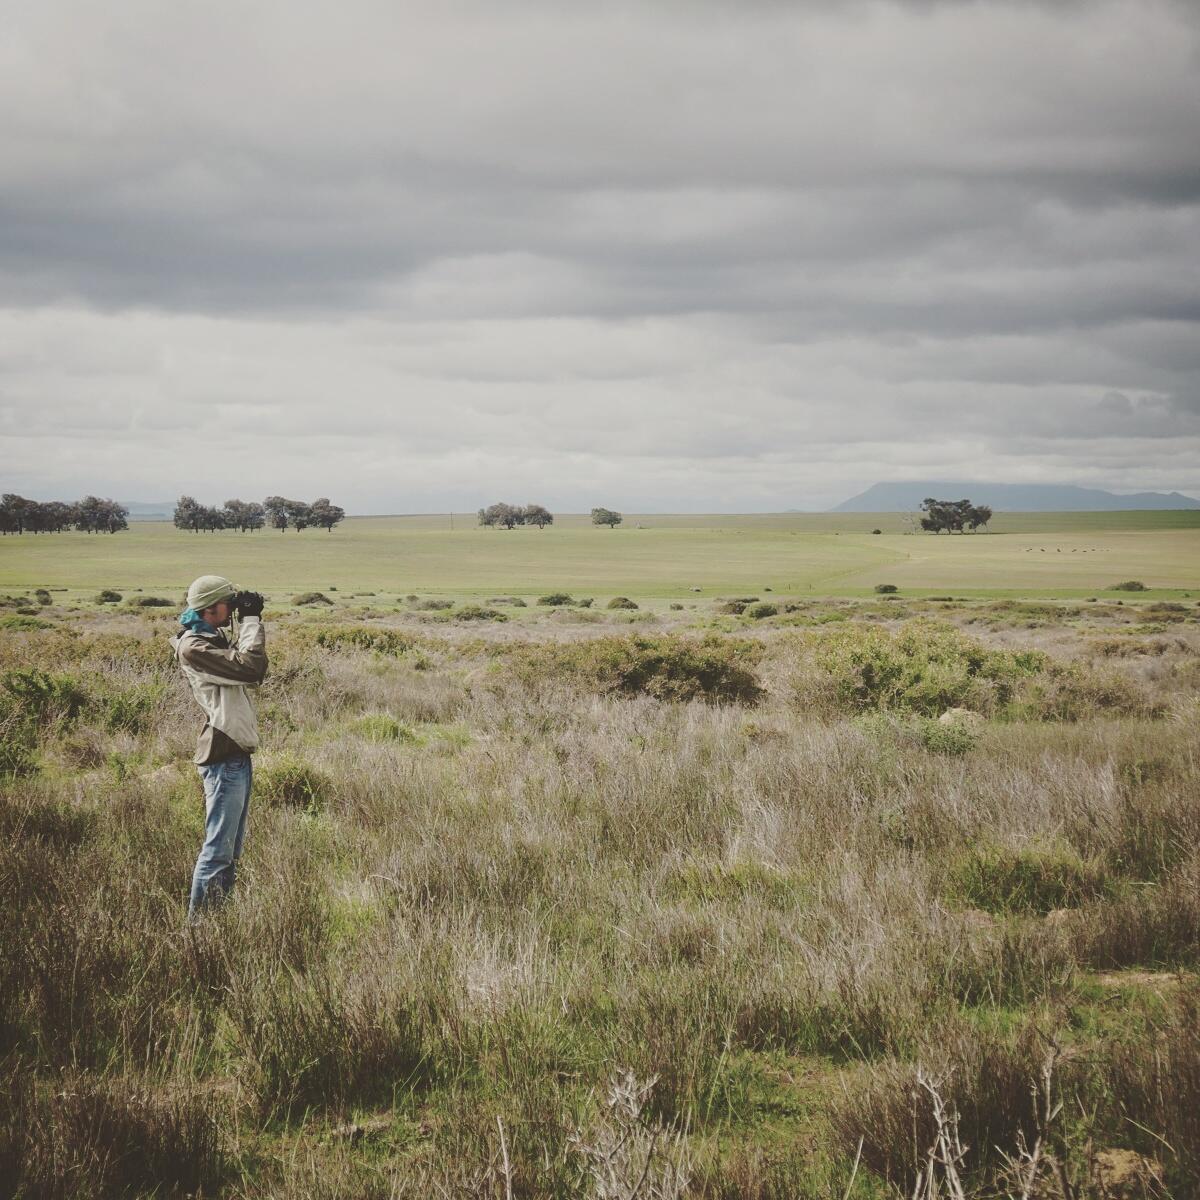 Ethan Kistler scans for larks in a grassland near West Coast National Park. Noah Strycker